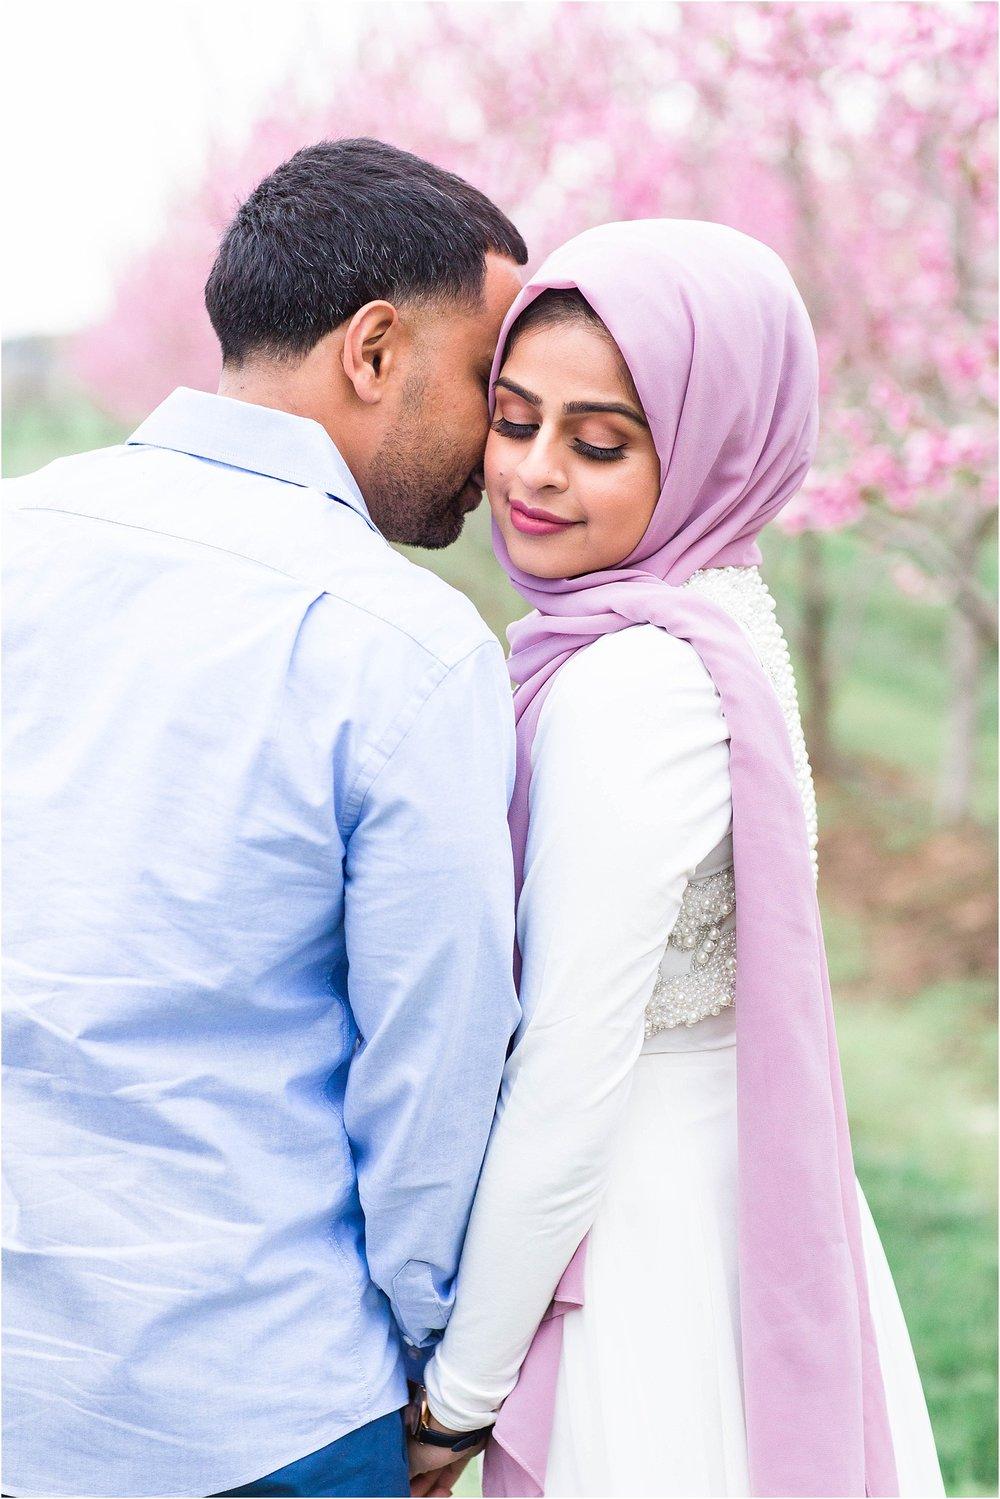 Niagara-on-the-lake-cherry-blossom-farm-Engagement-Session-Toronto-Mississauga-Brampton-Scarborough-GTA-Pakistani-Indian-Wedding-Engagement-Photographer-Photography_0015.jpg